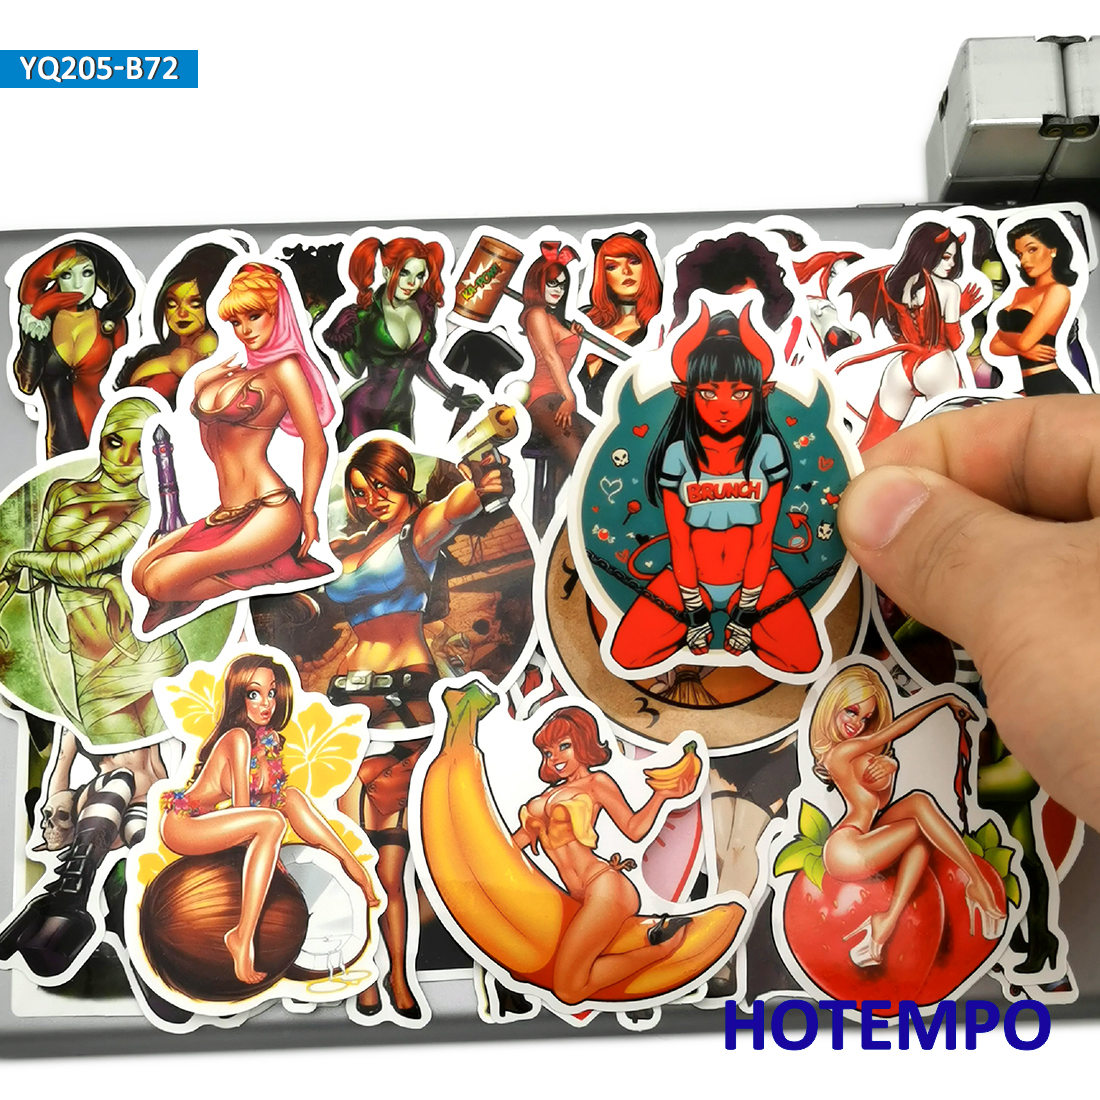 Angel She Devil Girl Decal Car Window Vinyl Decal Sticker laptop phone